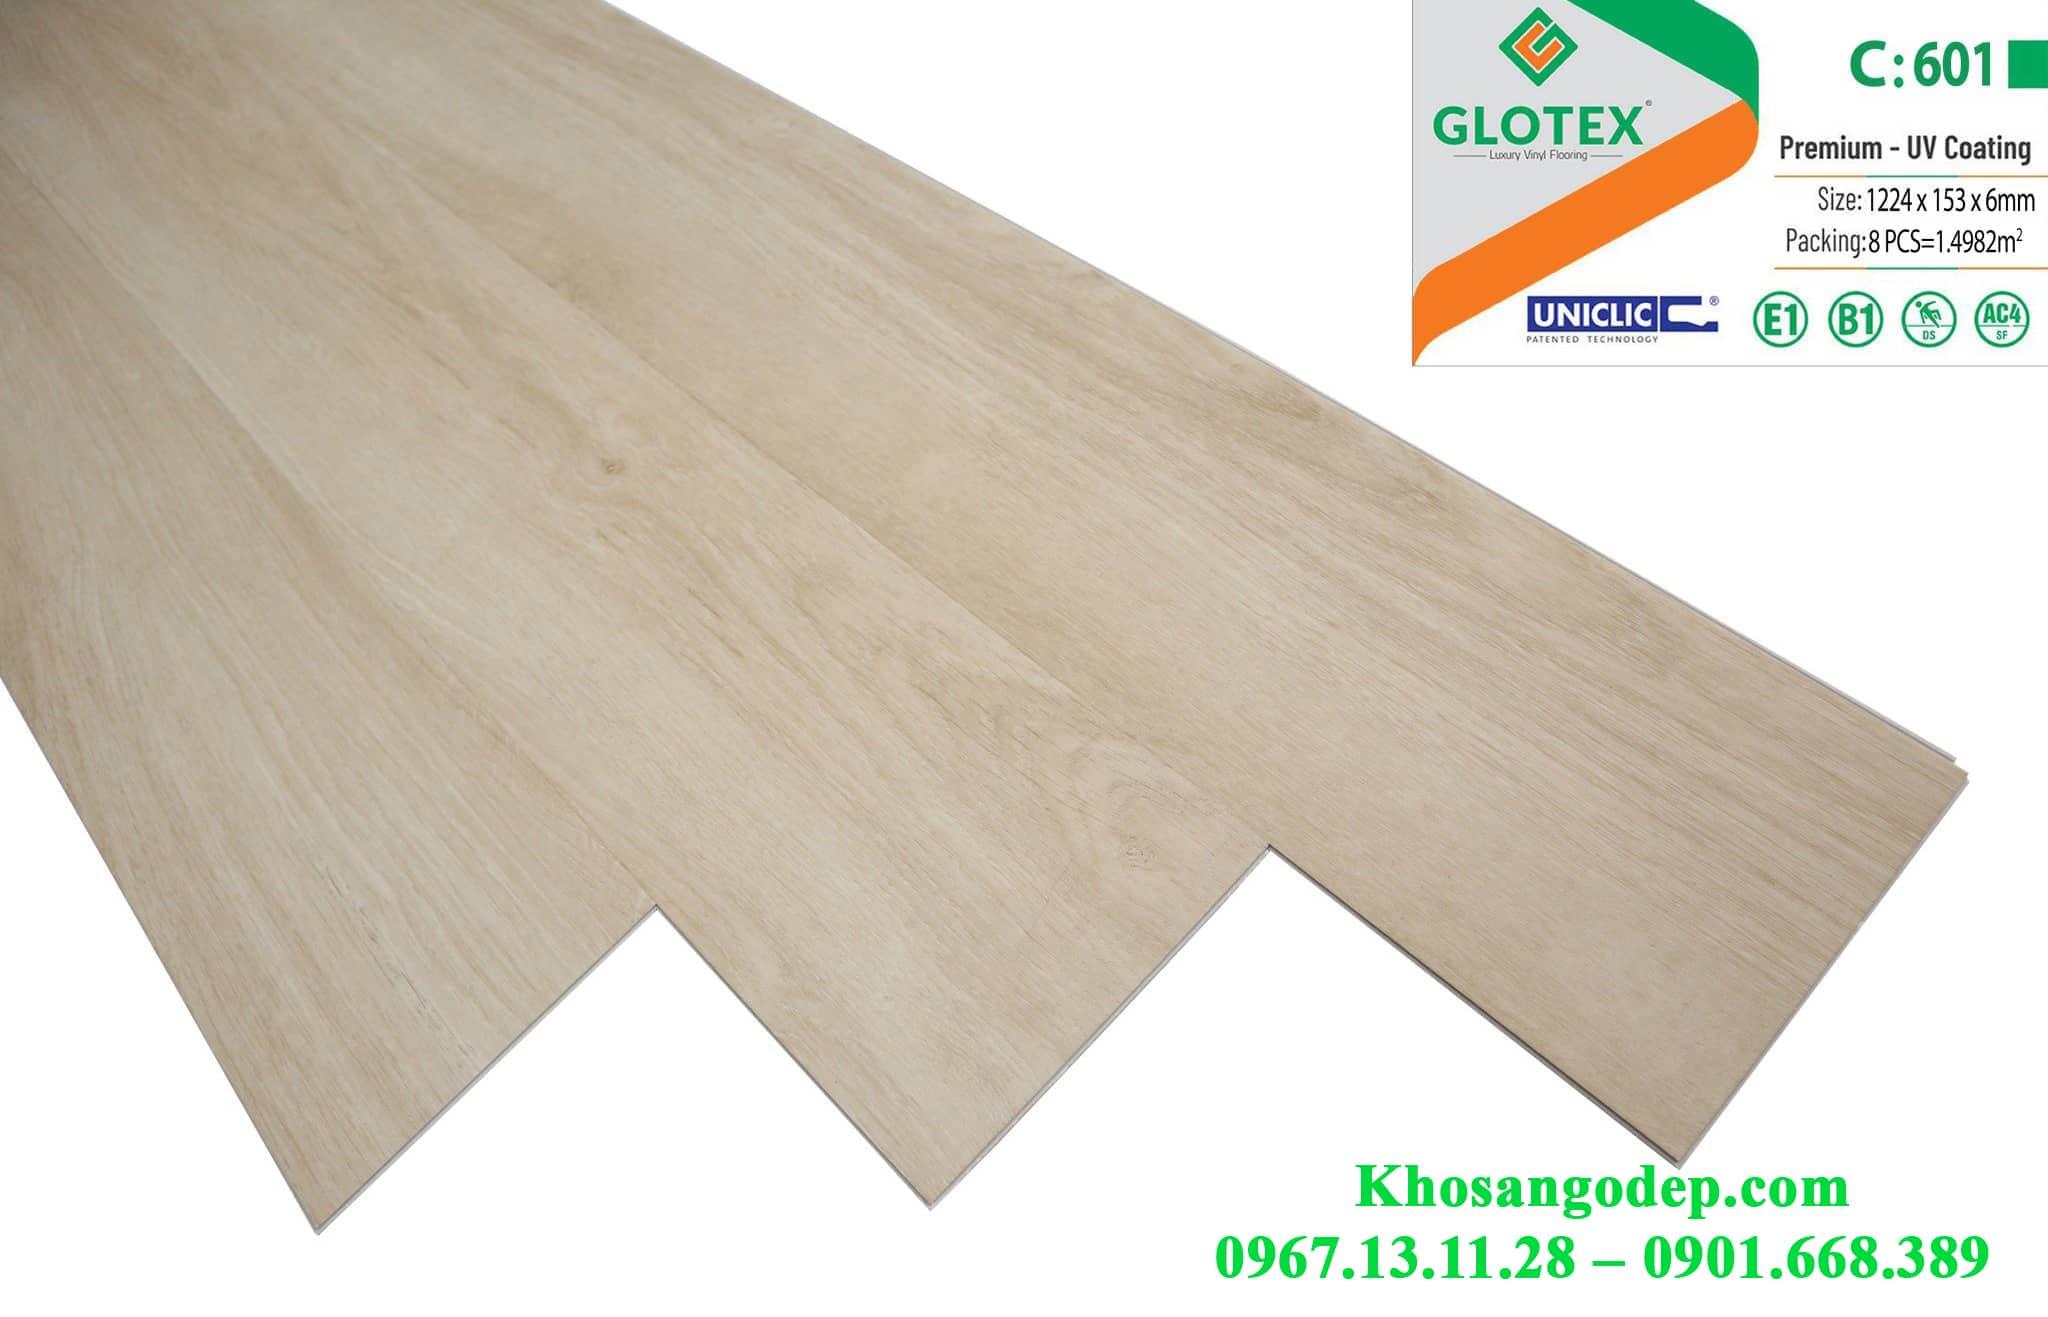 Sàn nhựa Glotex C601